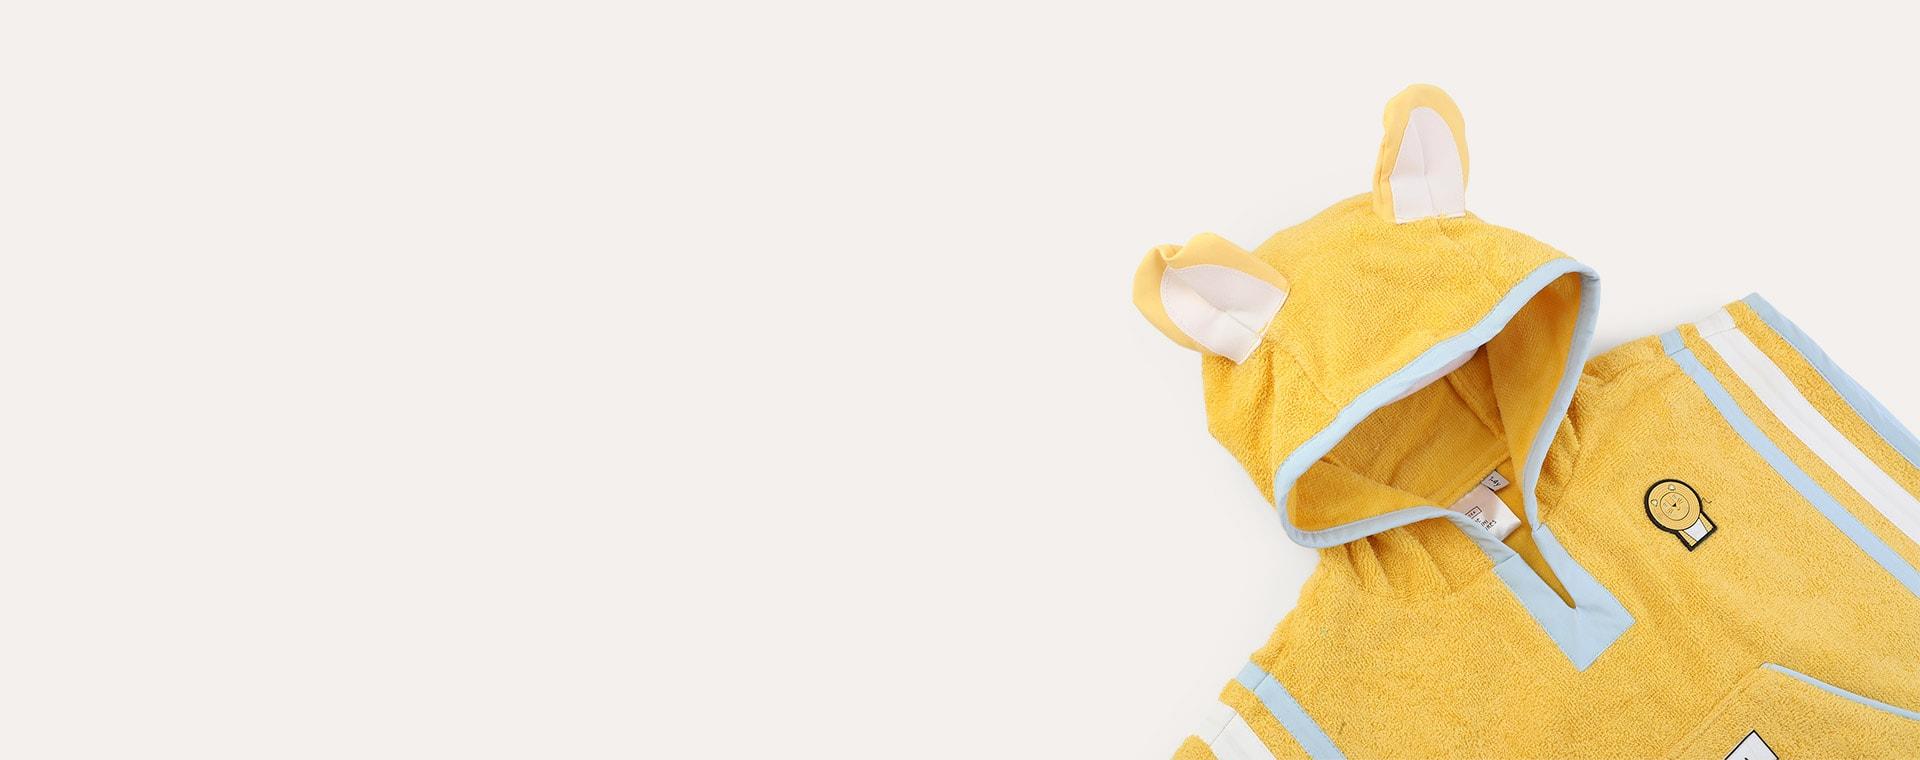 Cub dinoSea Hooded Towel